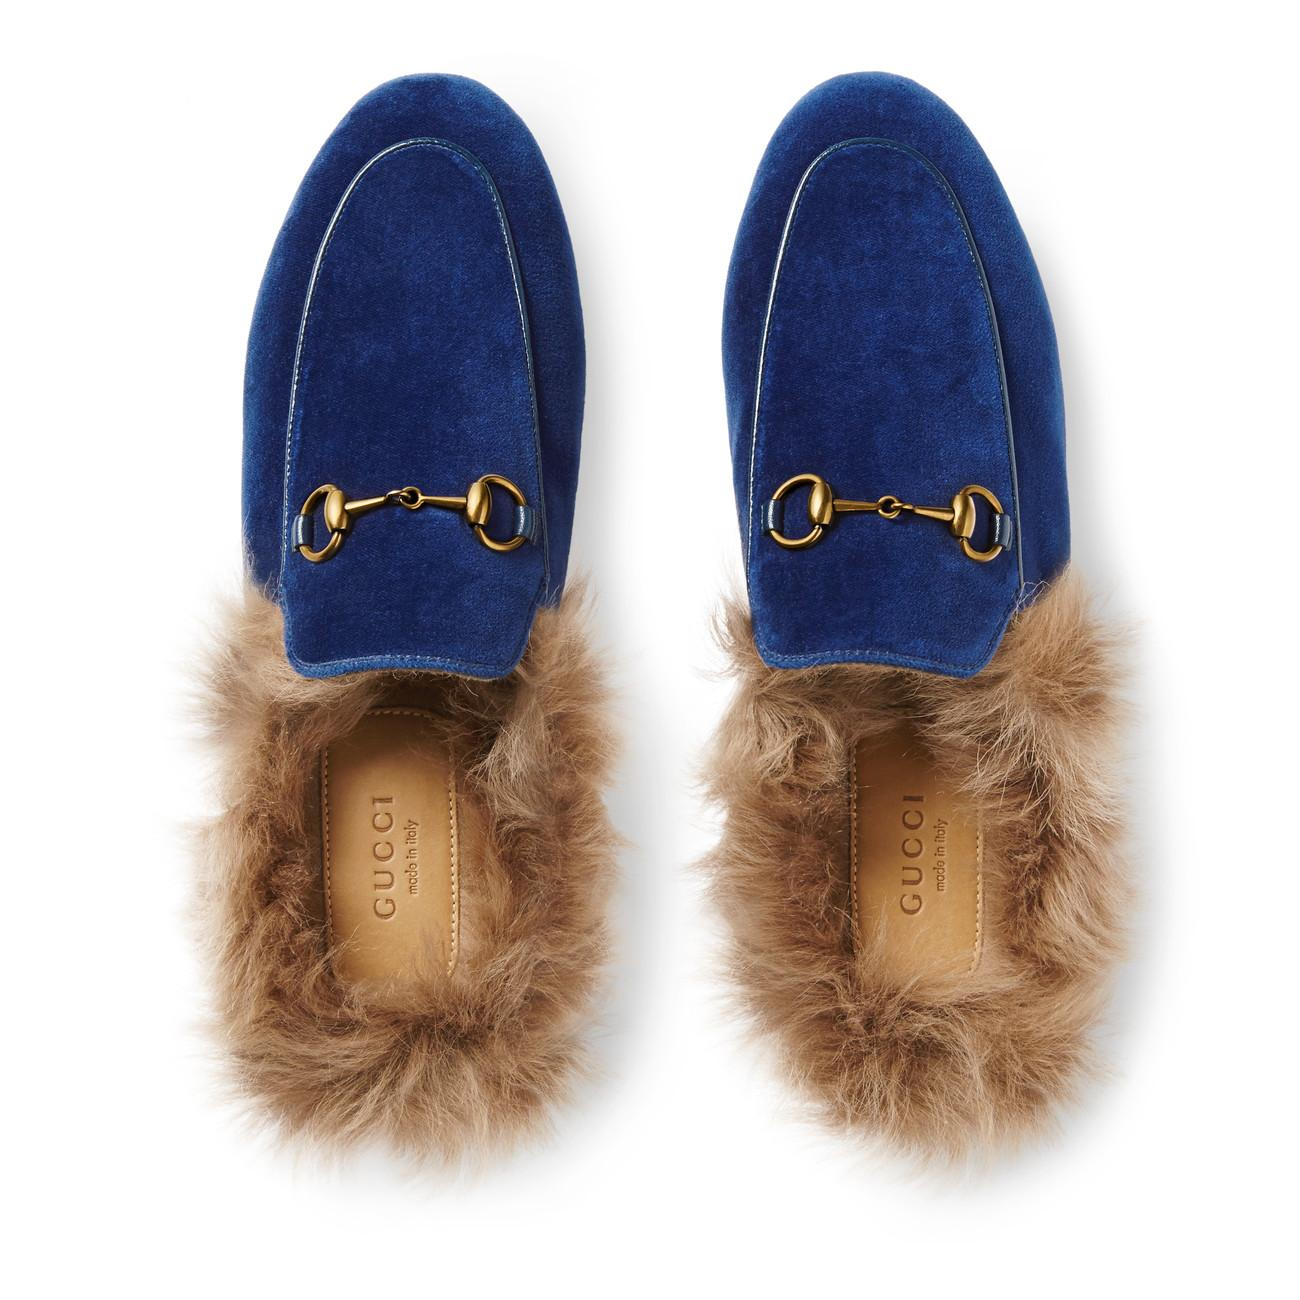 6bd0bff7cb8 Gucci - Blue Princetown Velvet Slipper - Lyst. View fullscreen